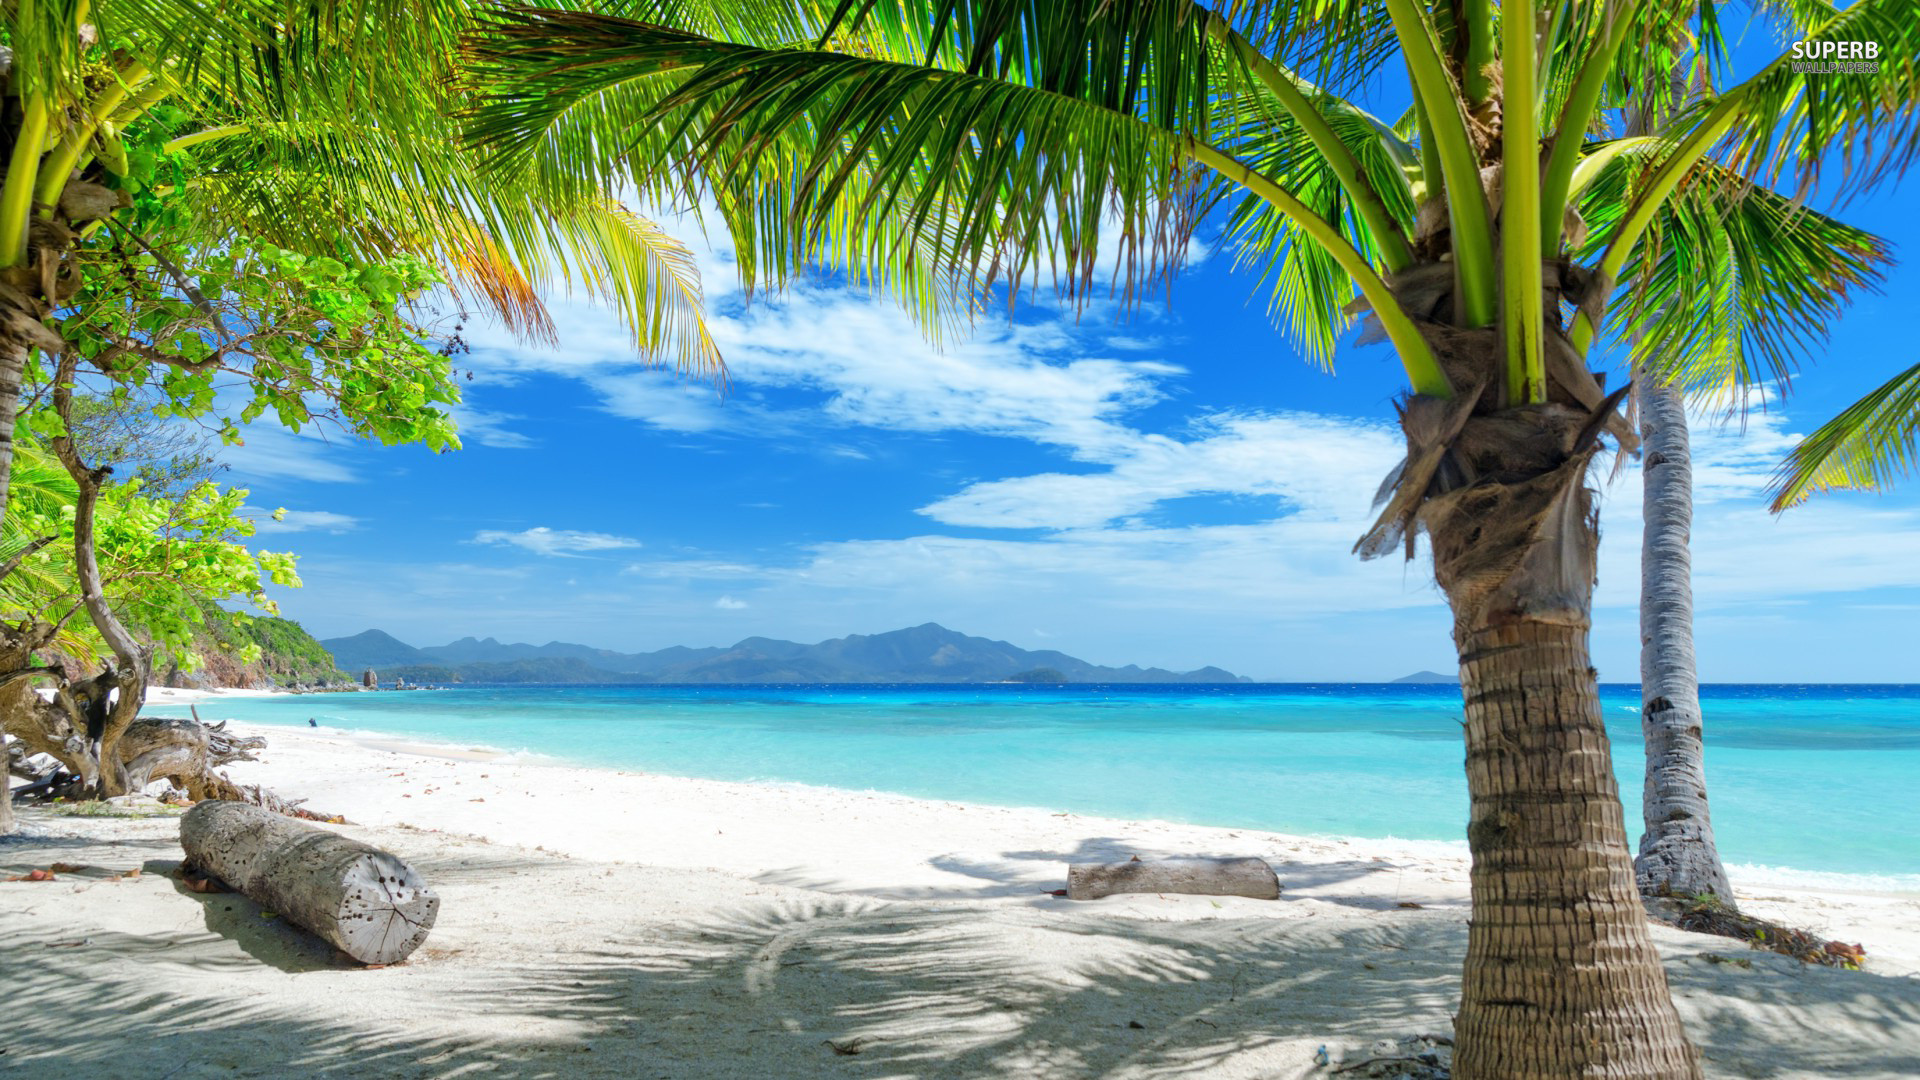 25 Beautiful Beach Wallpapers HD – MixHD wallpapers